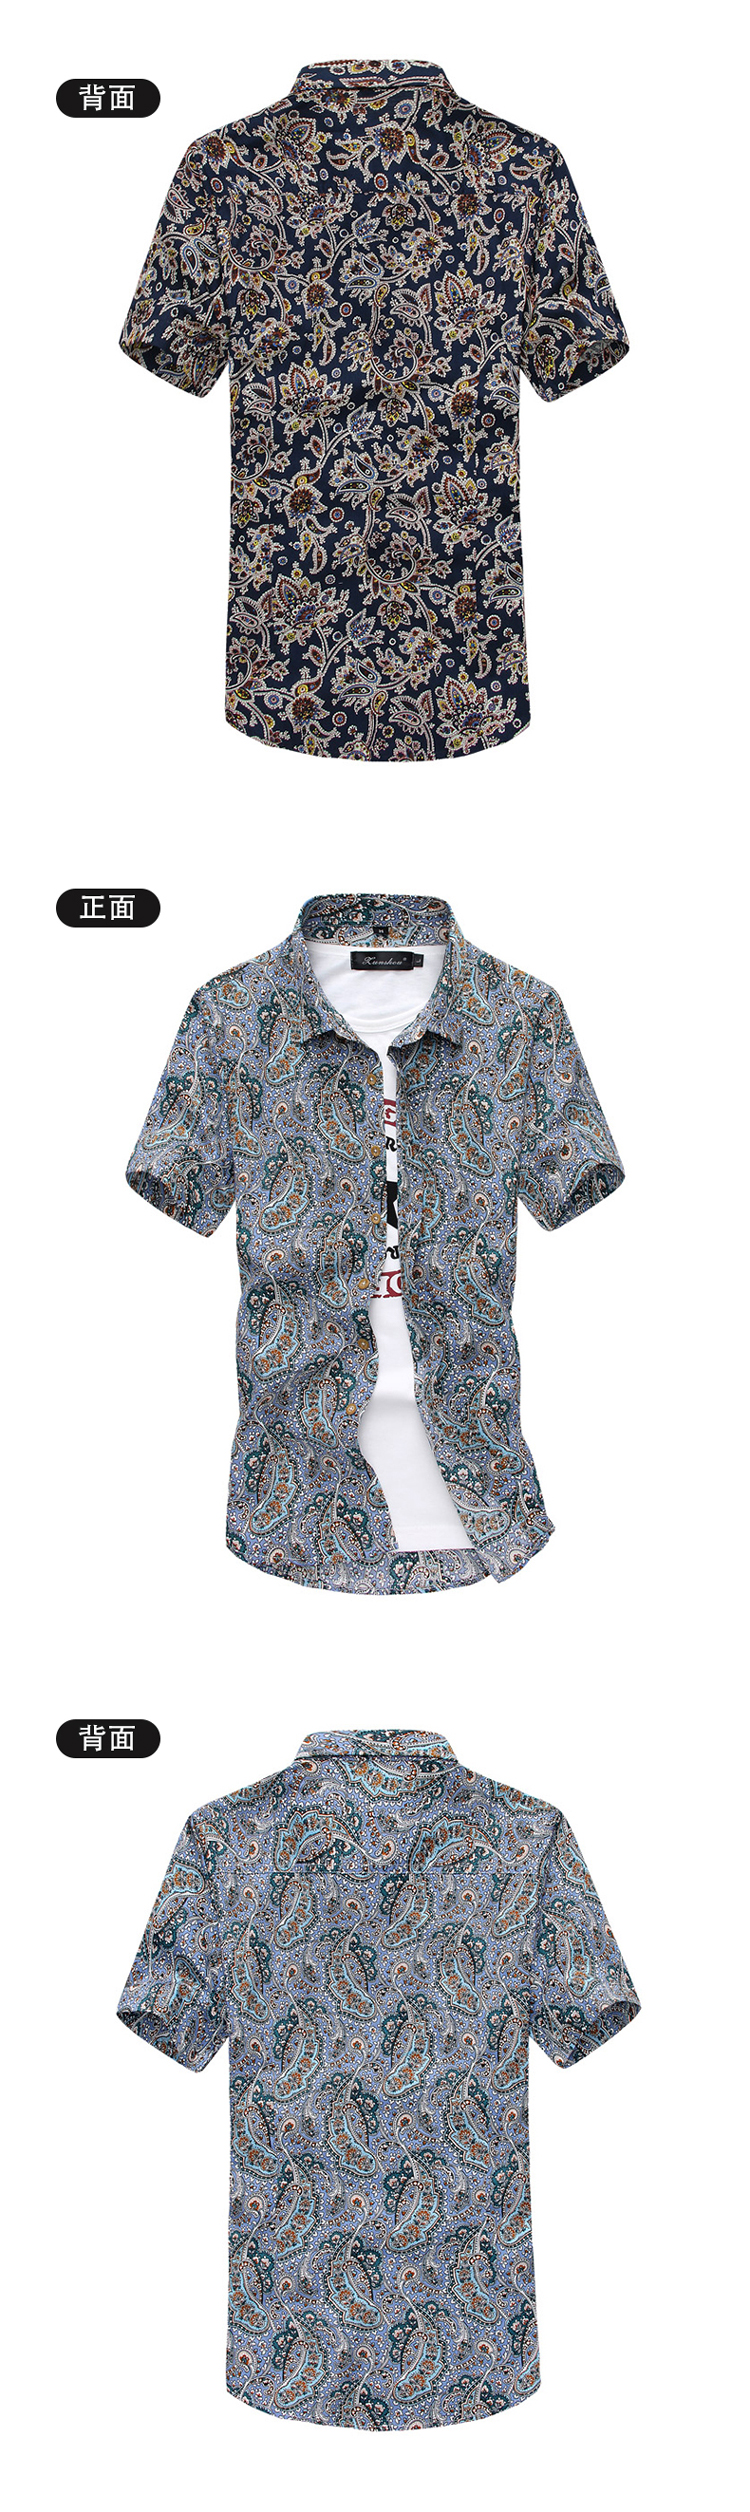 Men Summer Thin Shirts Short Sleeve Floral Shirts New Fashion Men Outwear Casual Slim Shirts Mens Cotton dress shirts 9